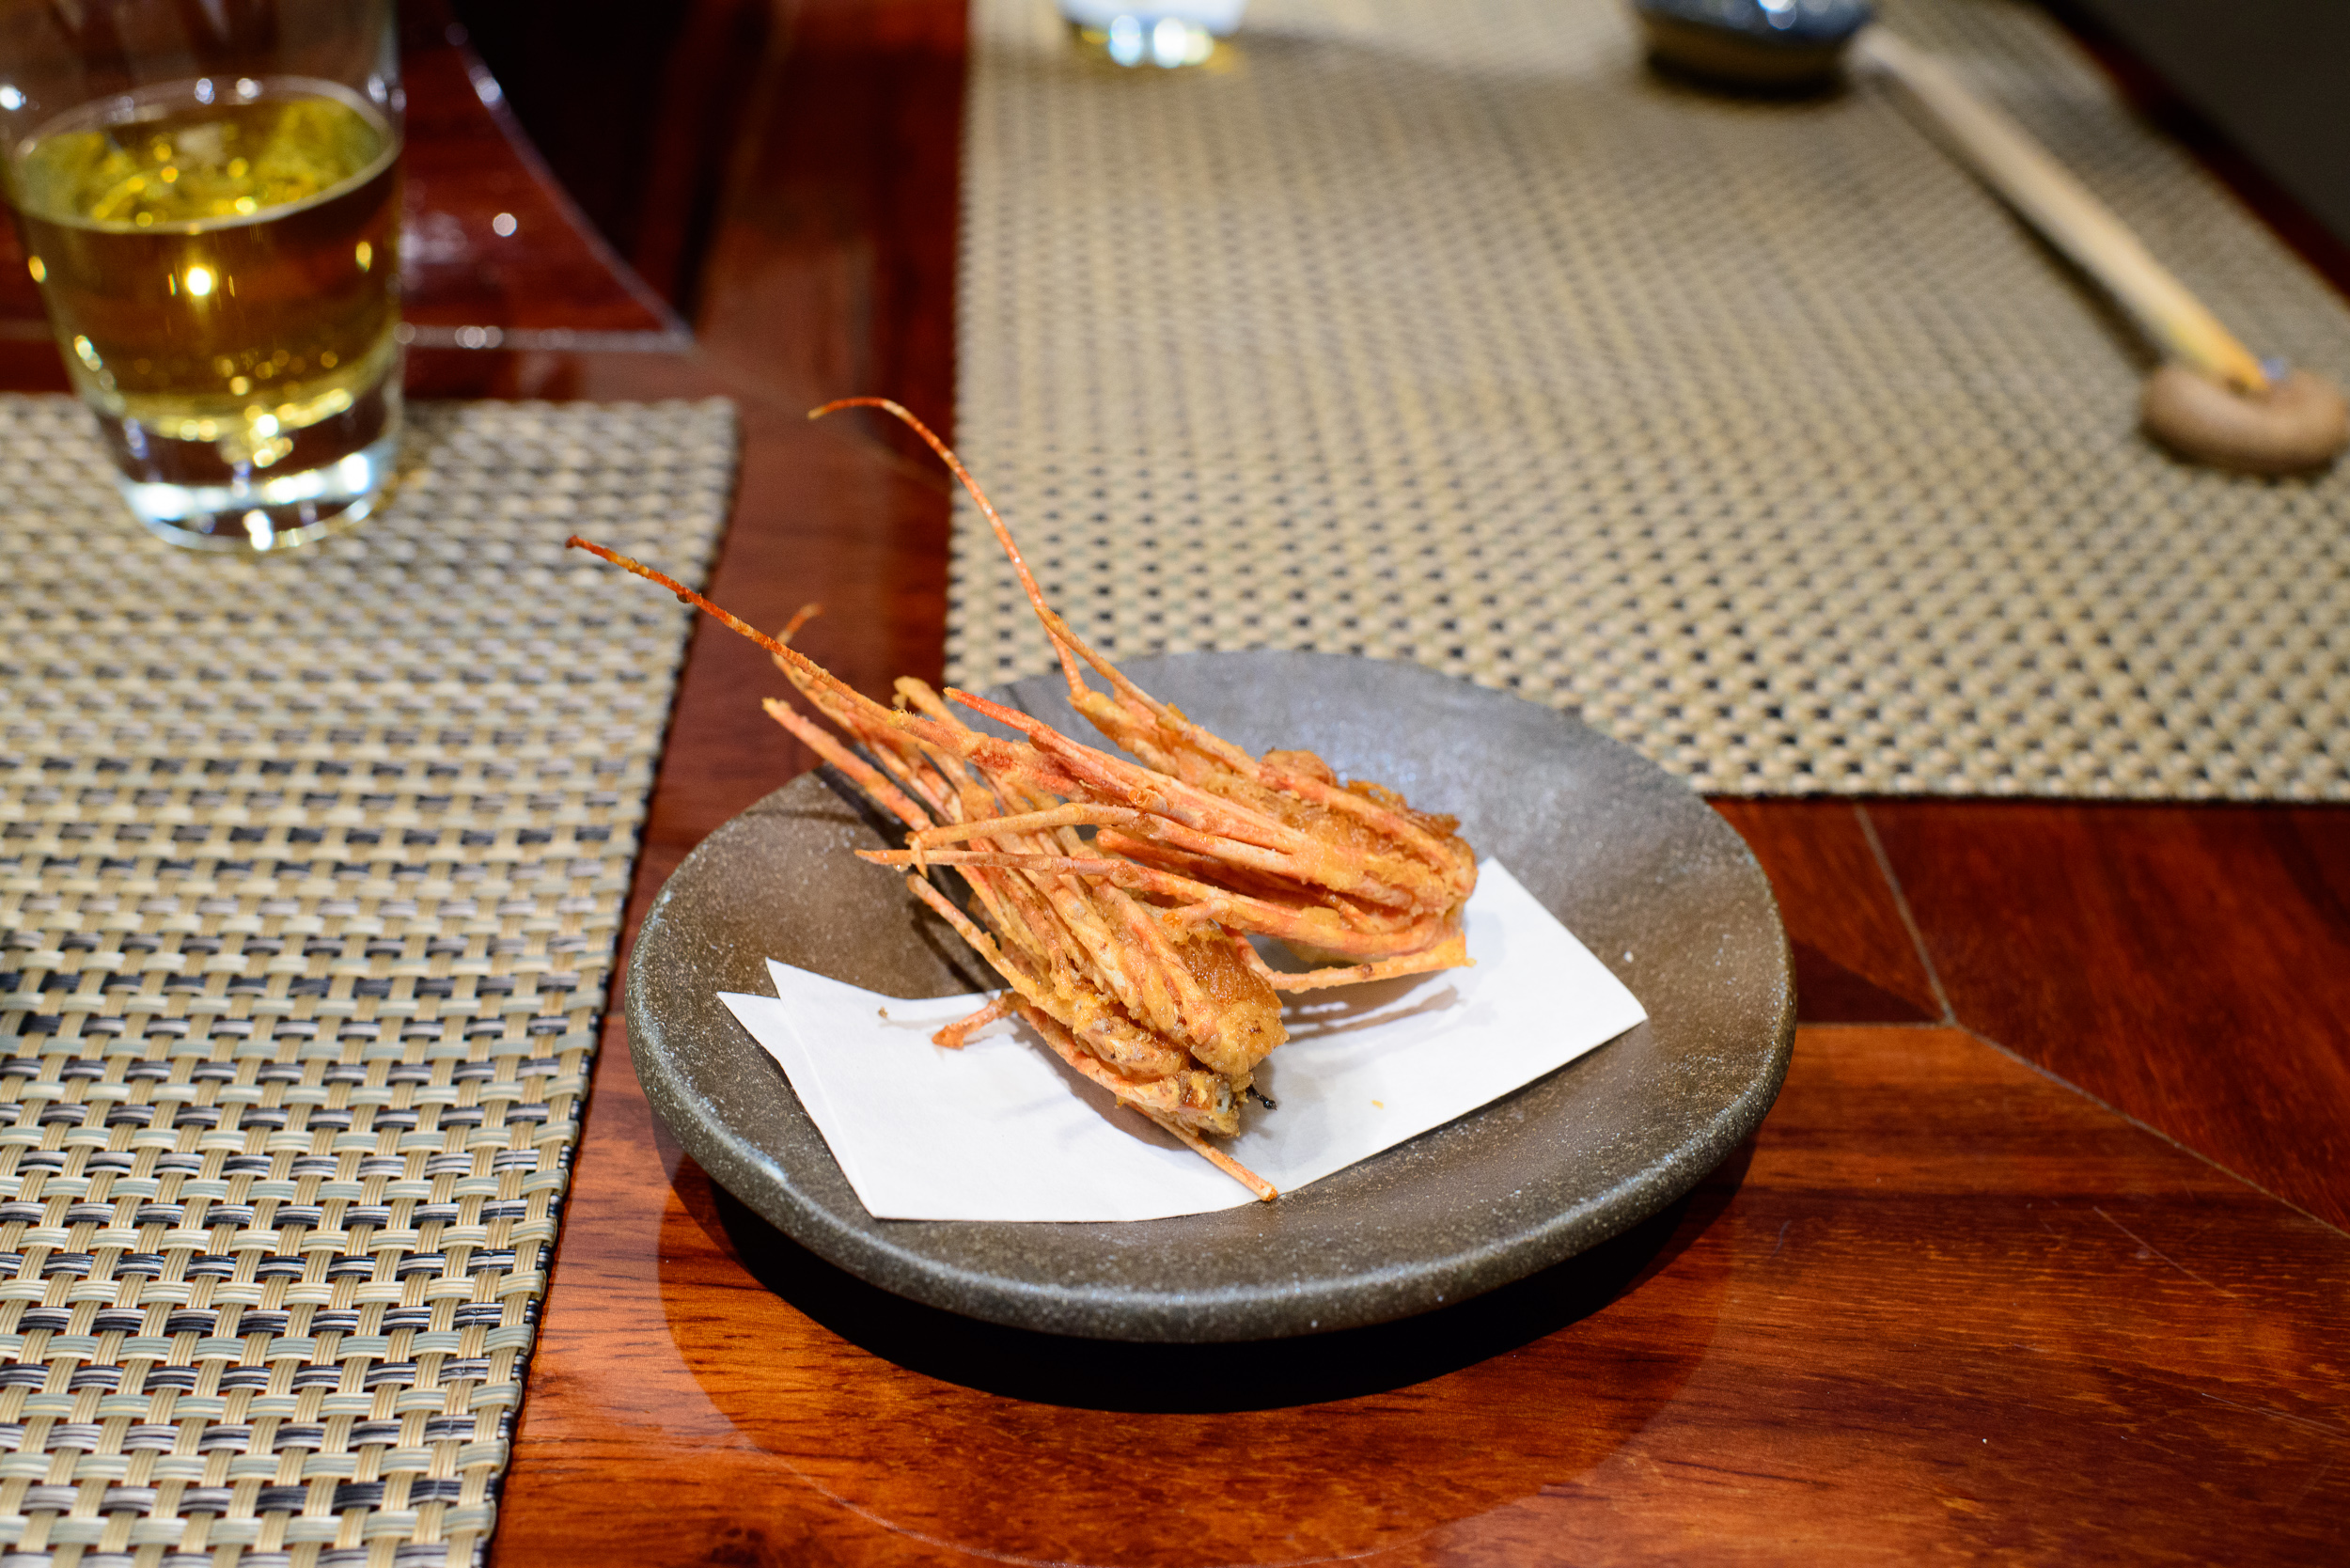 7th Course: Crispy shrimp head